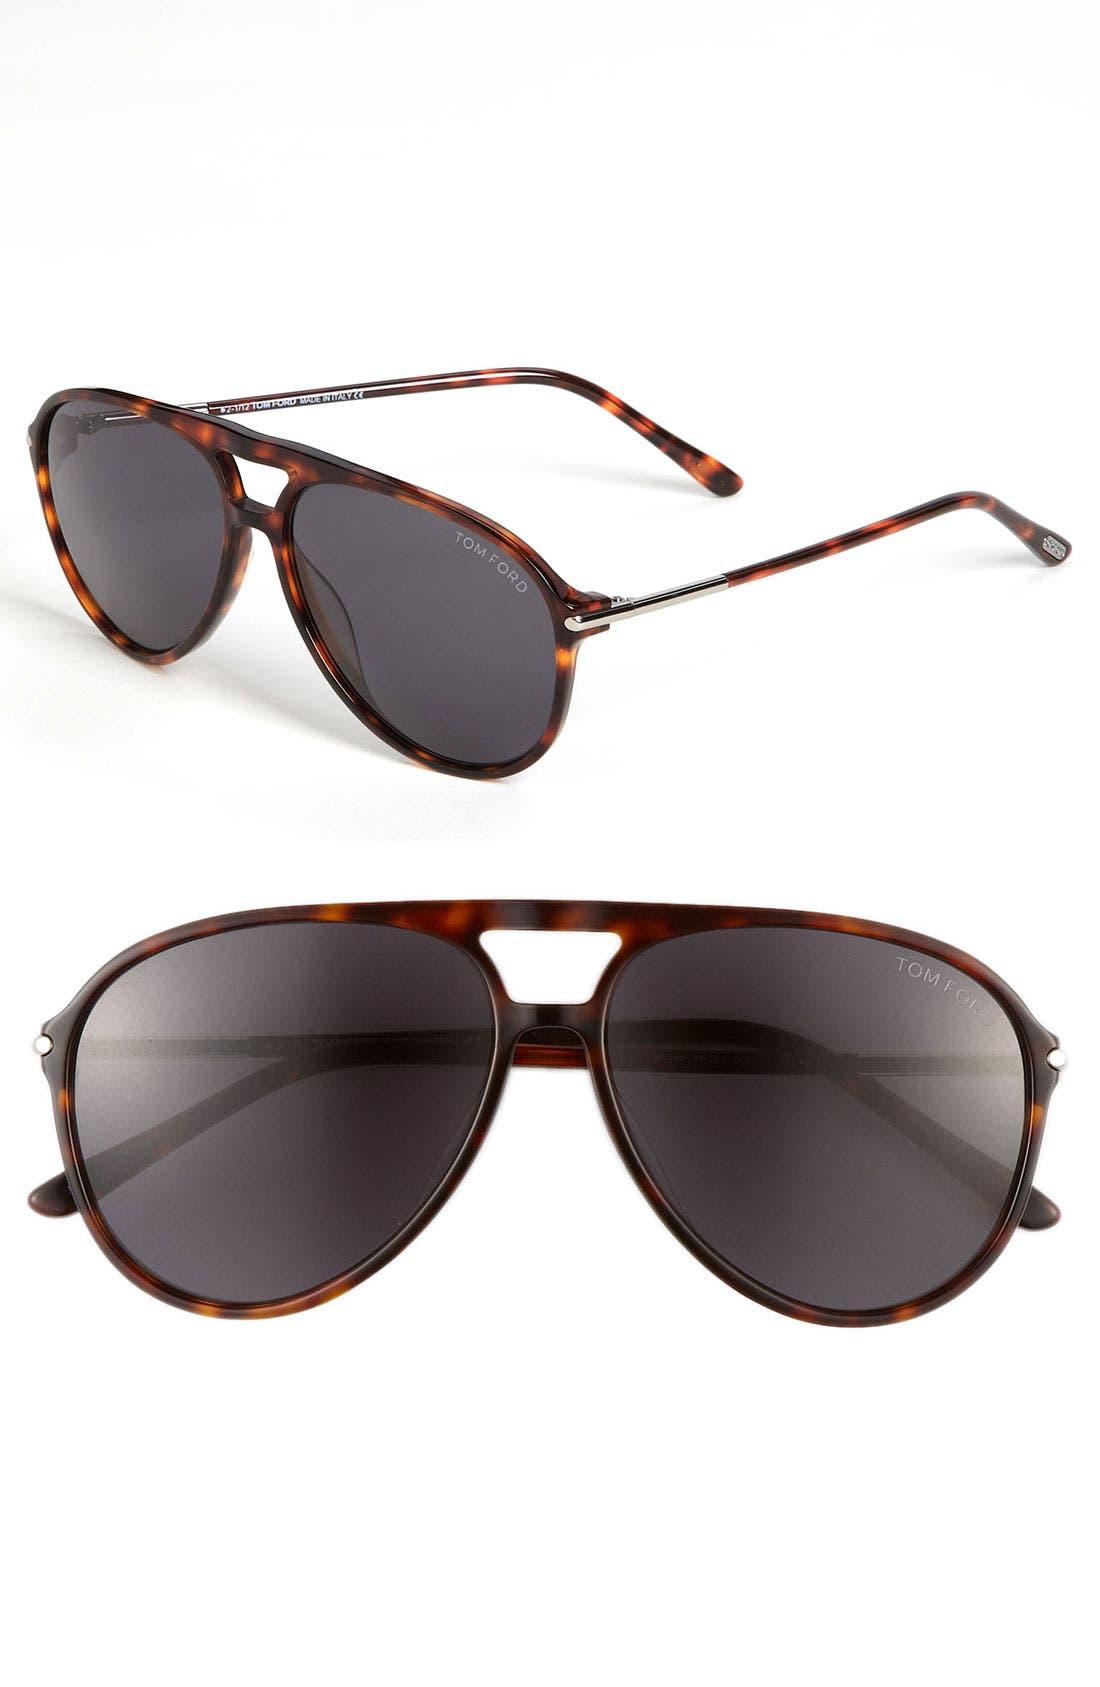 Main Image - Tom Ford 59mm Aviator Sunglasses